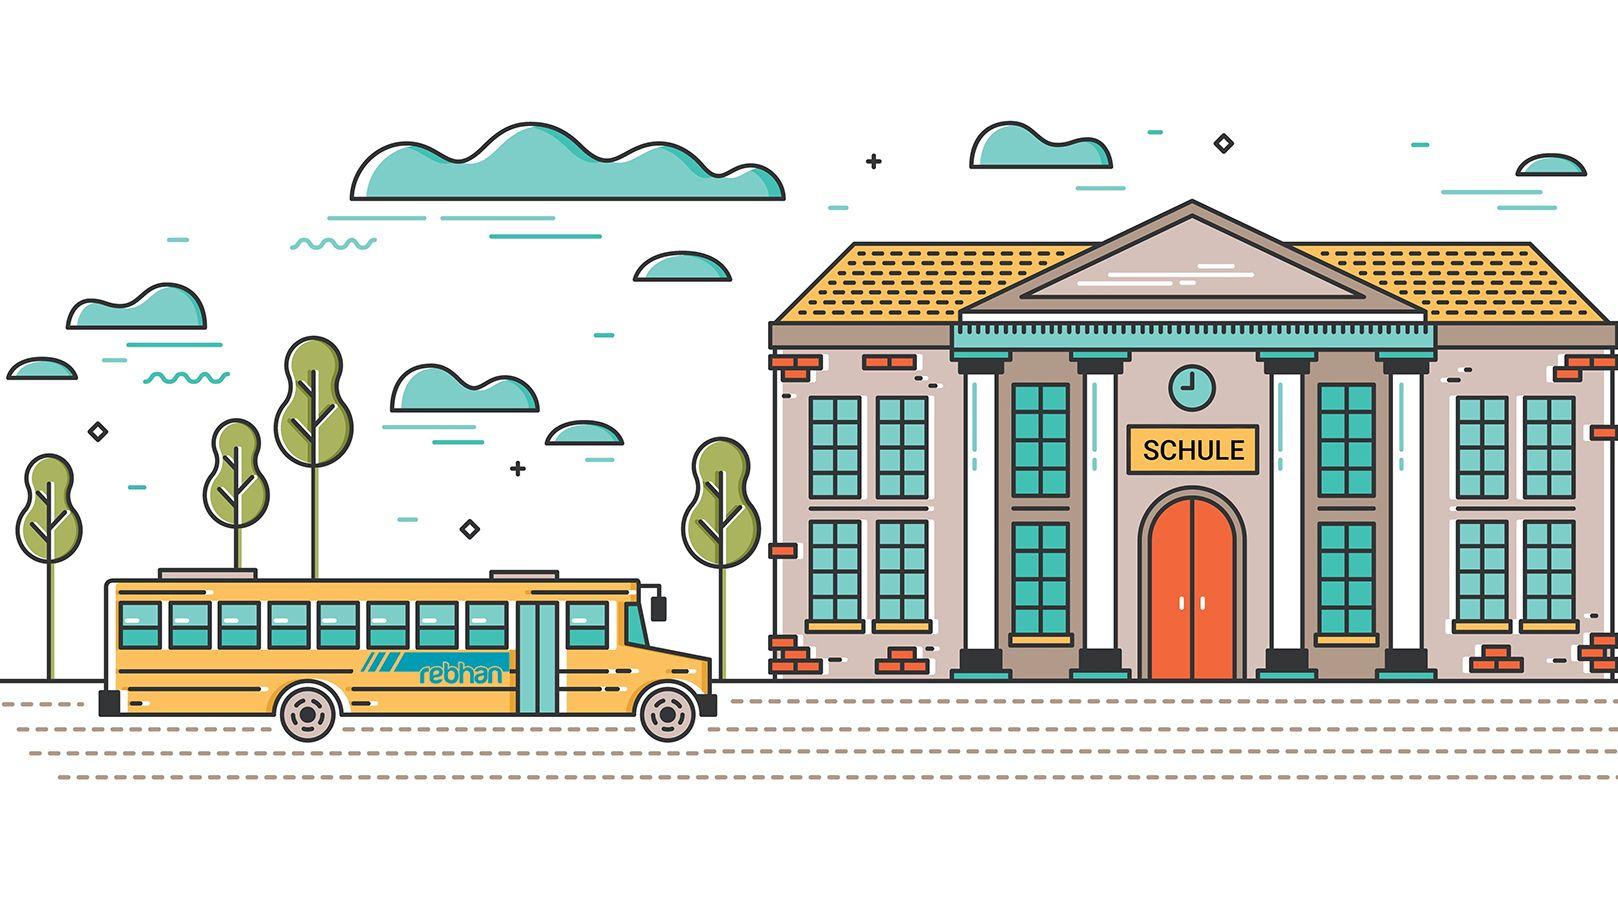 Schülertransporte mit rebhan